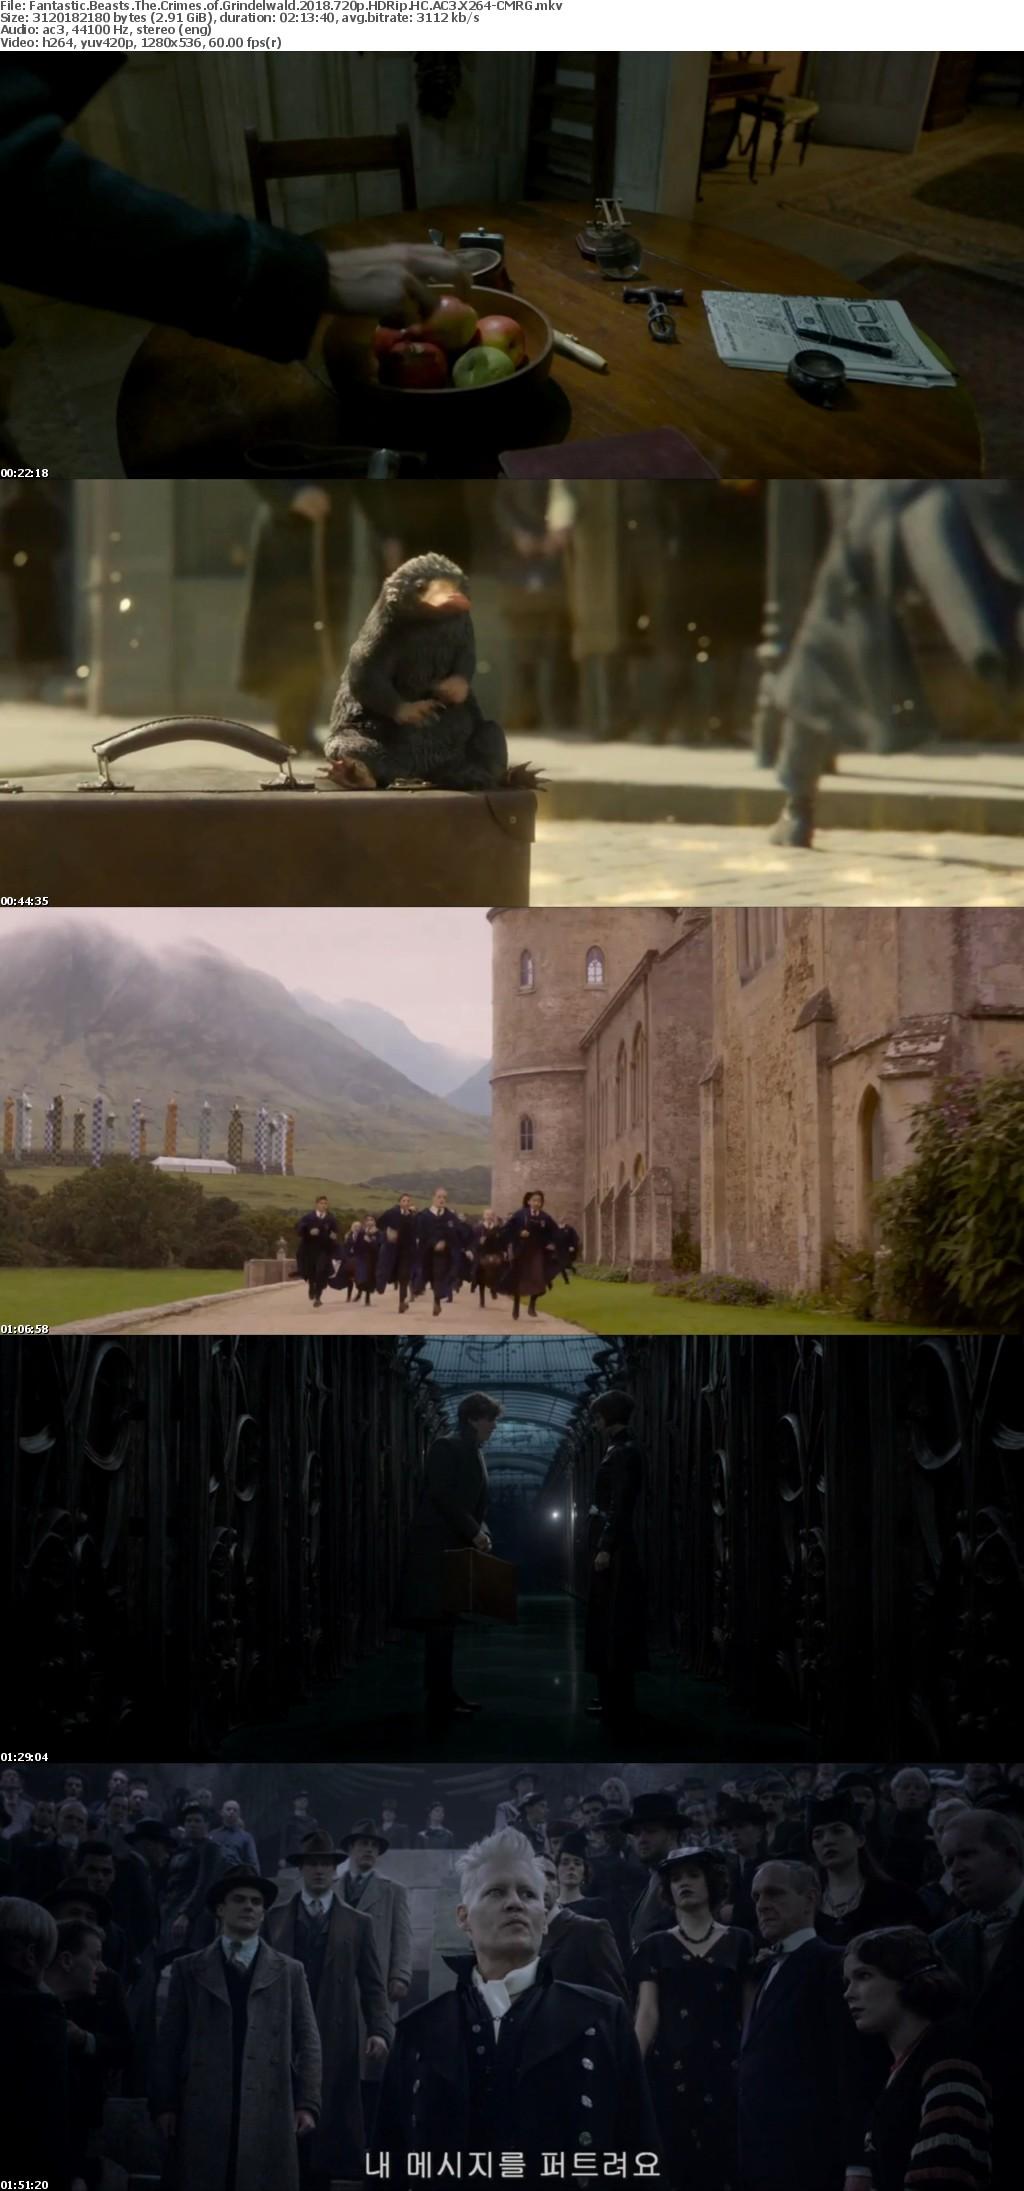 Fantastic Beasts The Crimes of Grindelwald 2018 720p HDRip HC AC3 X264-CMRG[TGx]